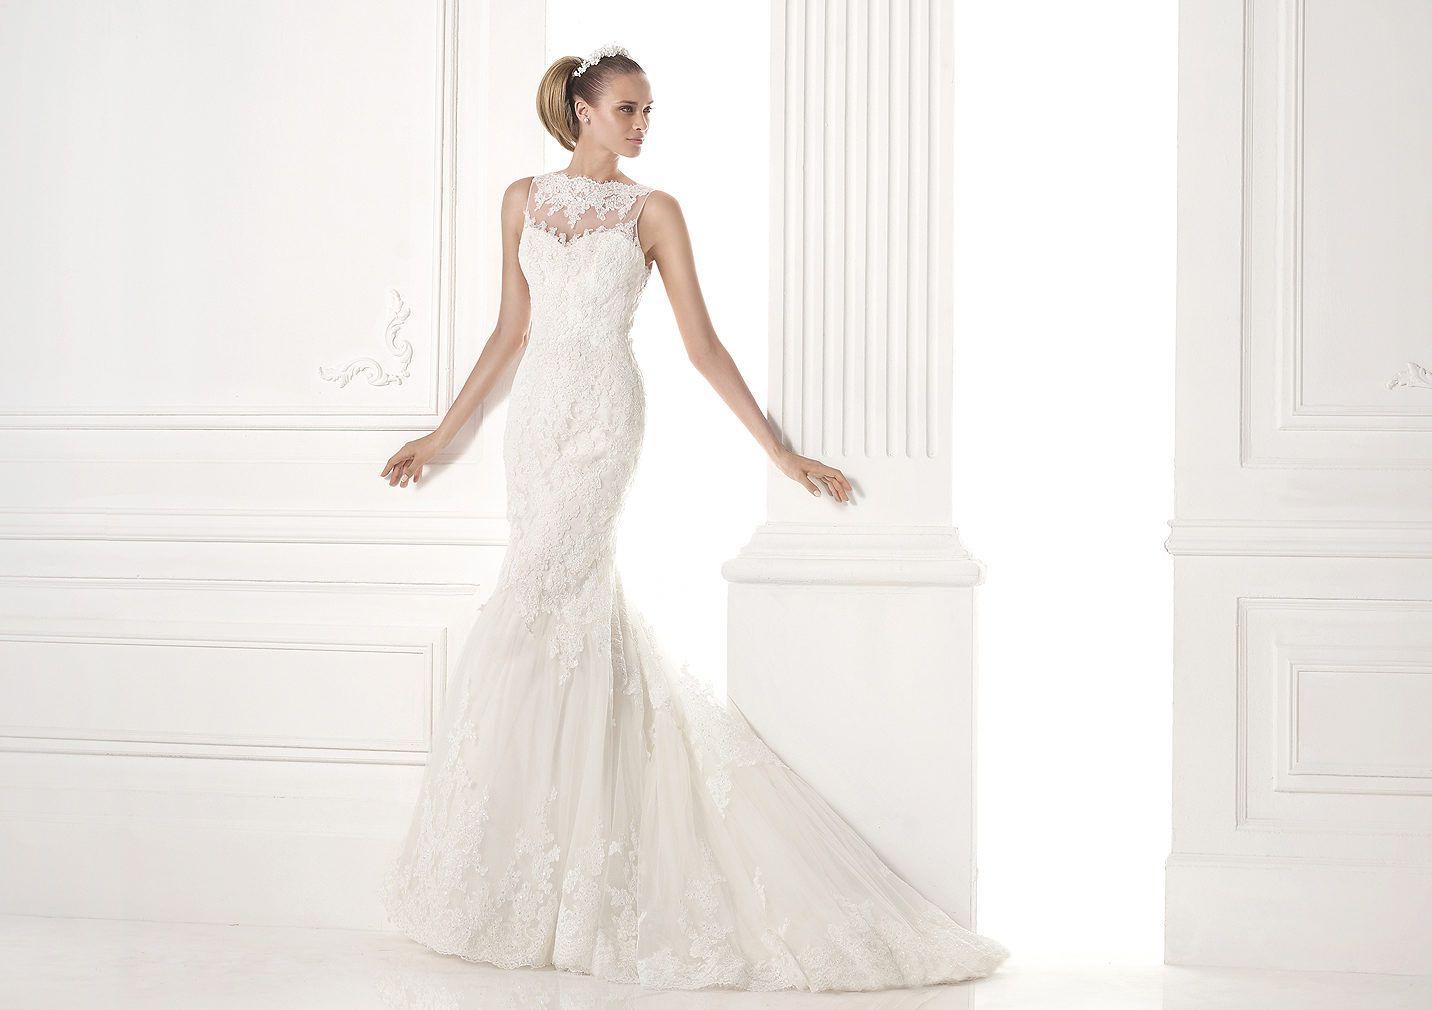 MARYLAND - Vestido novia con falda con godet. Pronovias 2015 ...